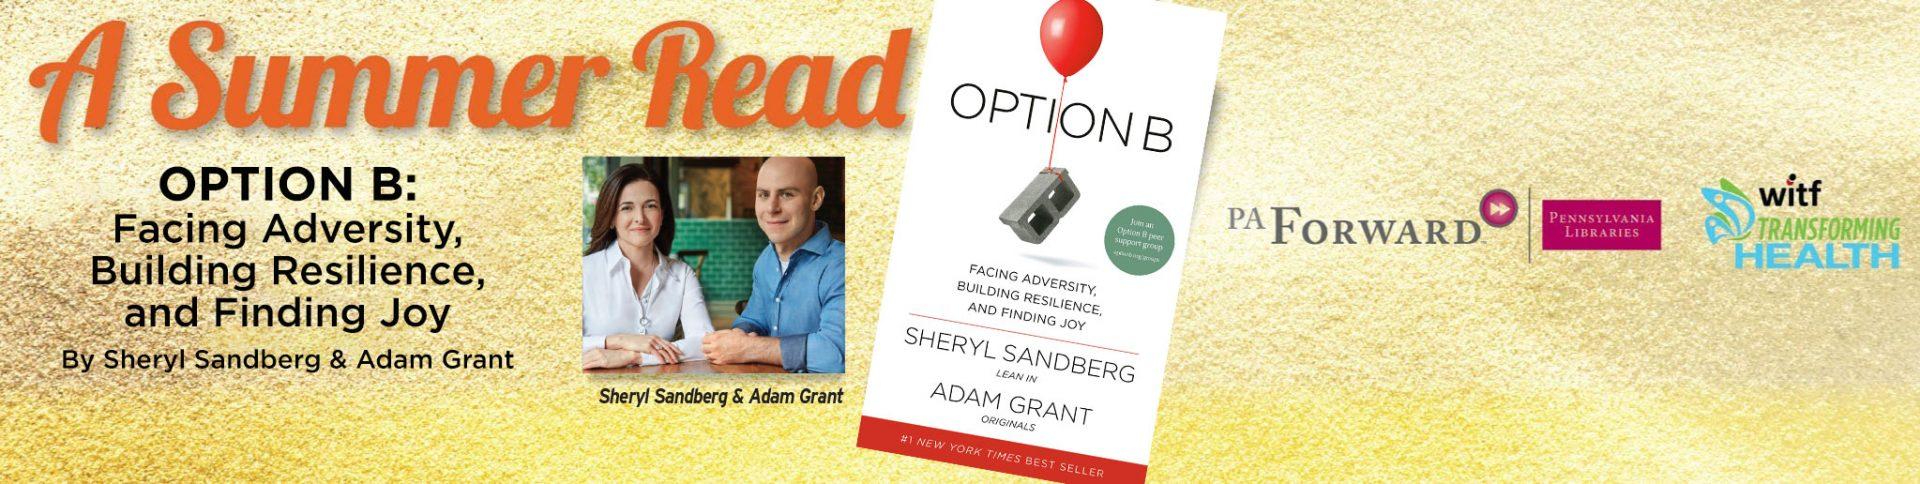 A Summer Read - Option B